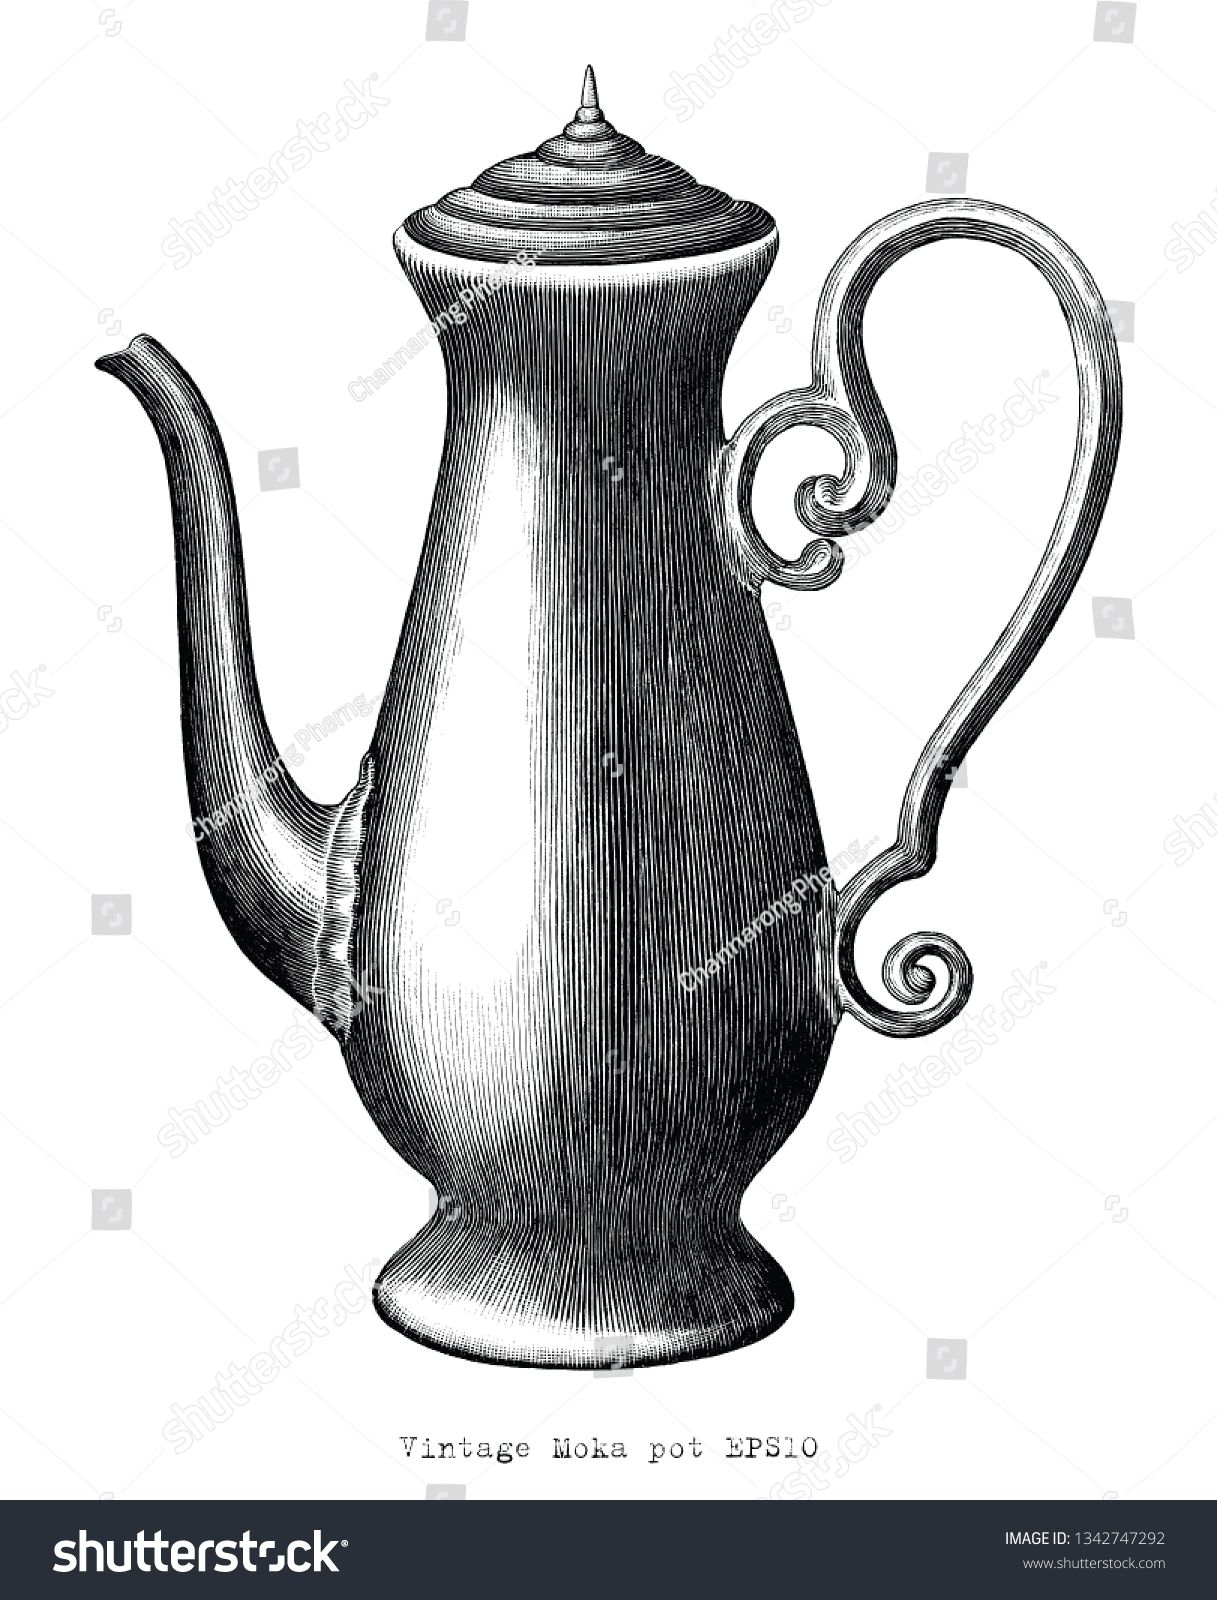 Antique Engraving Illustration Of Moka Pot Black And White Clip Art Isolated On White Background Ad Spon M Engraving Illustration Illustration Art Design